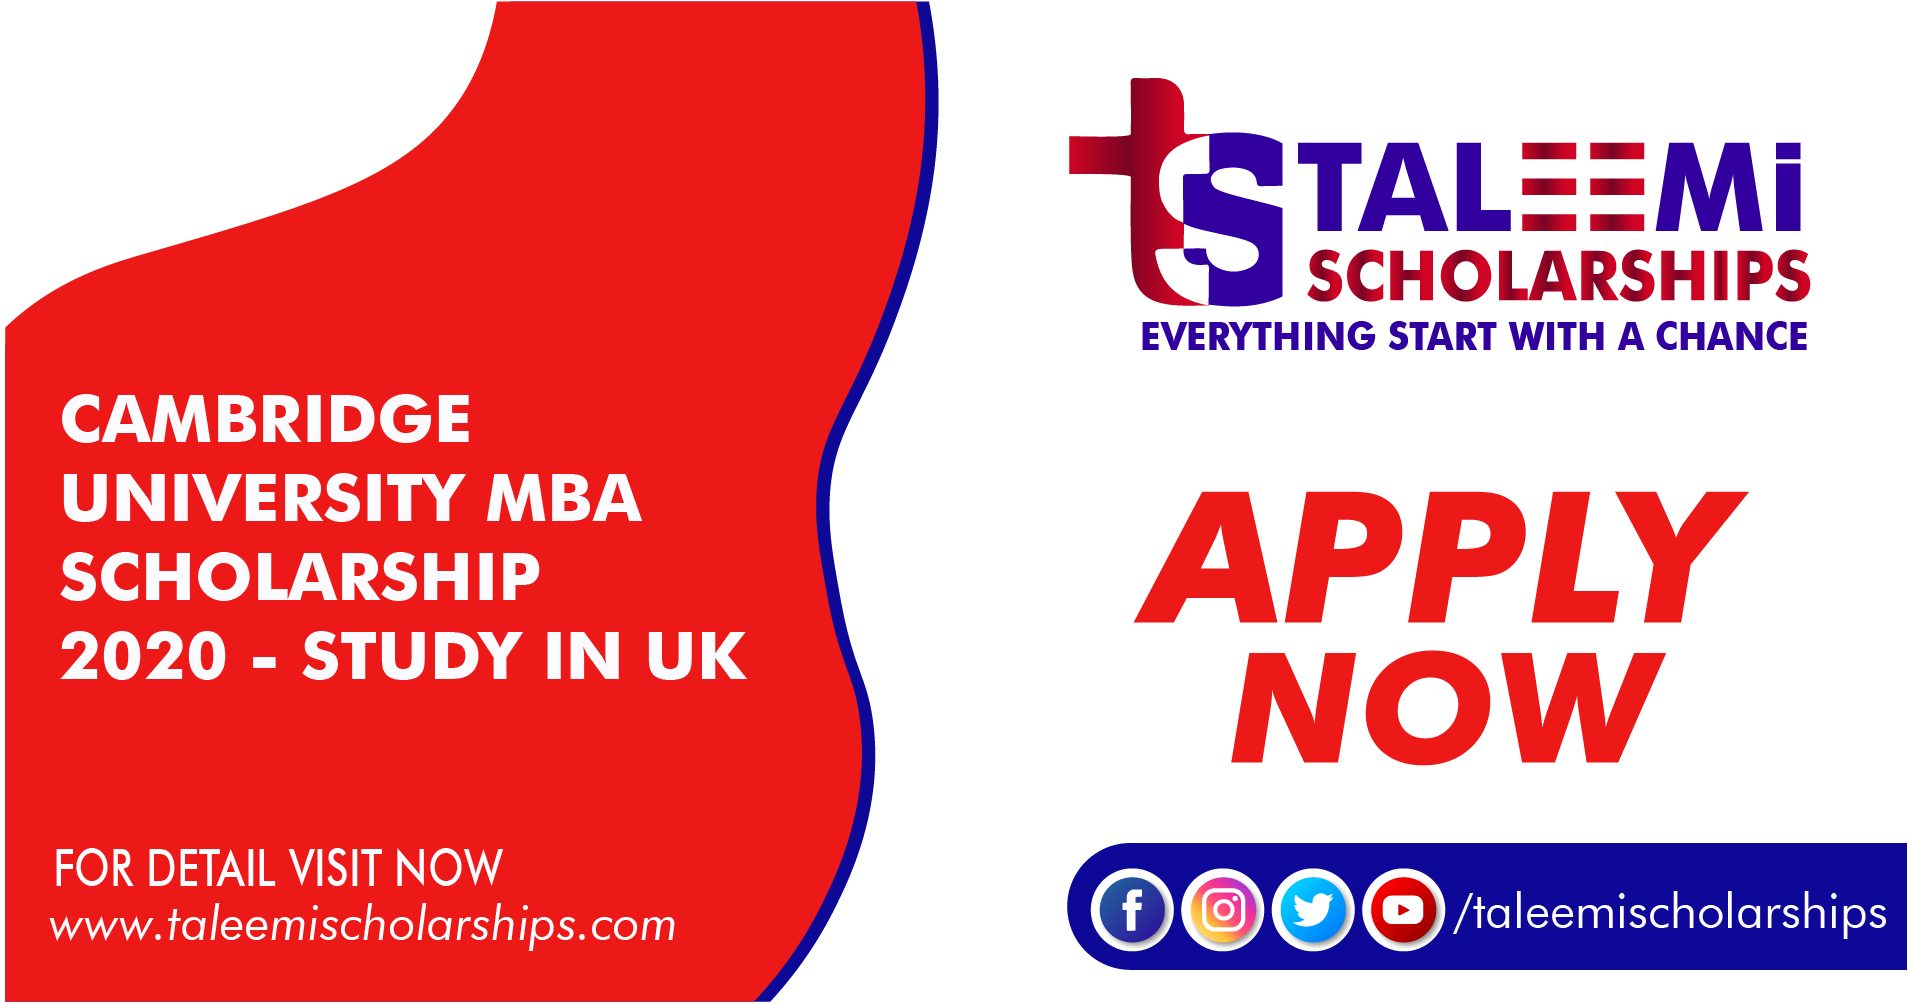 CAMBRIDGE UNIVERSITY MBA SCHOLARSHIP 2020 - STUDY IN UK